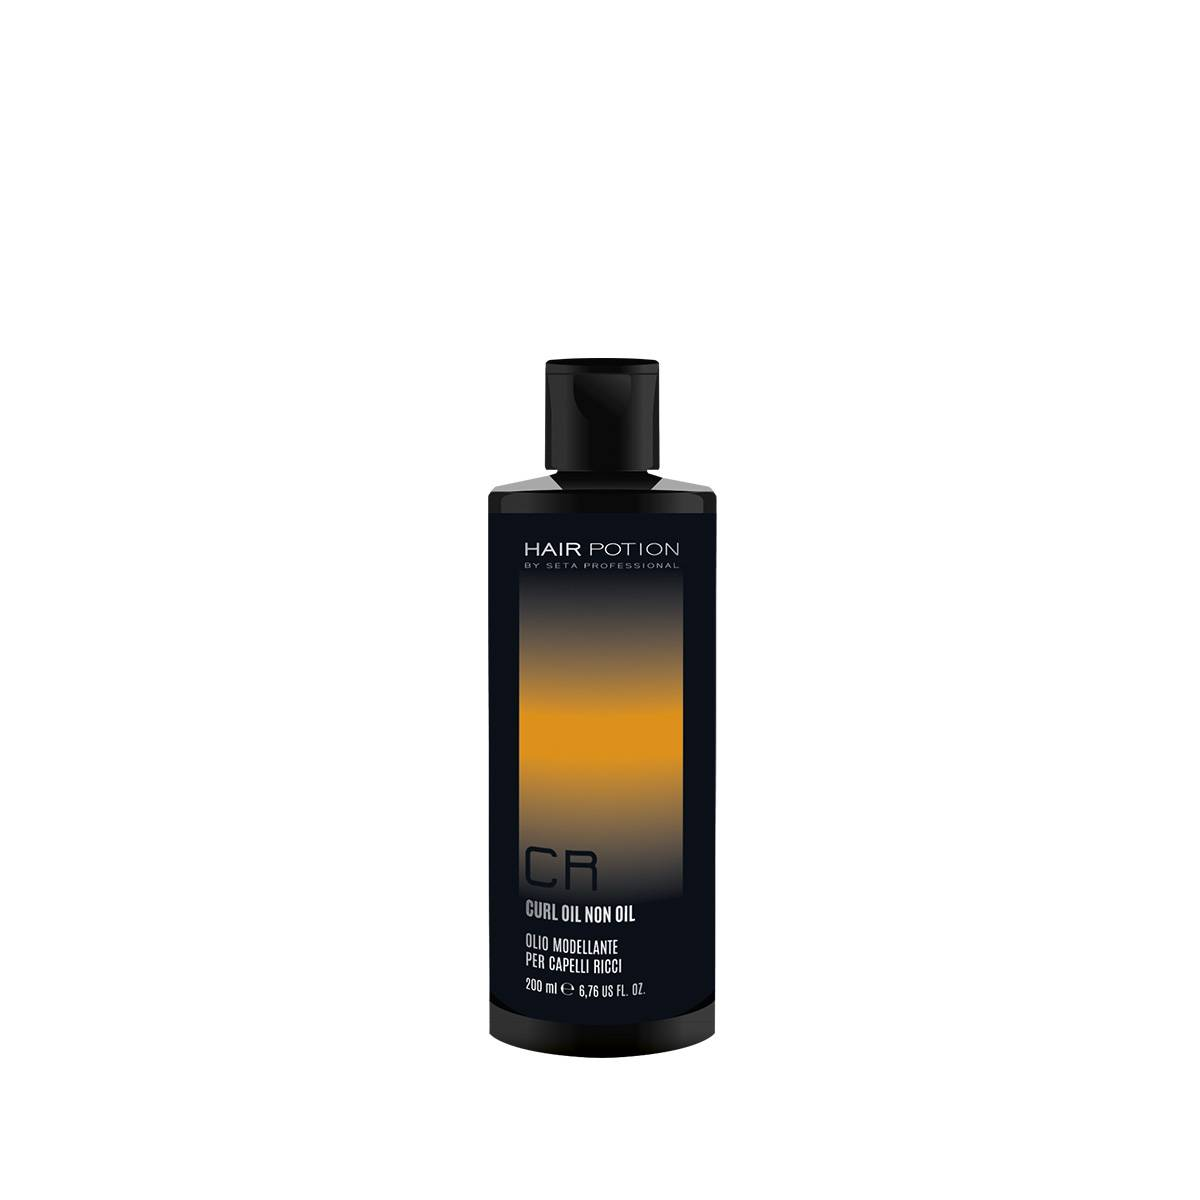 Hair Potion Pro Curl Oil Non Oil 200ml